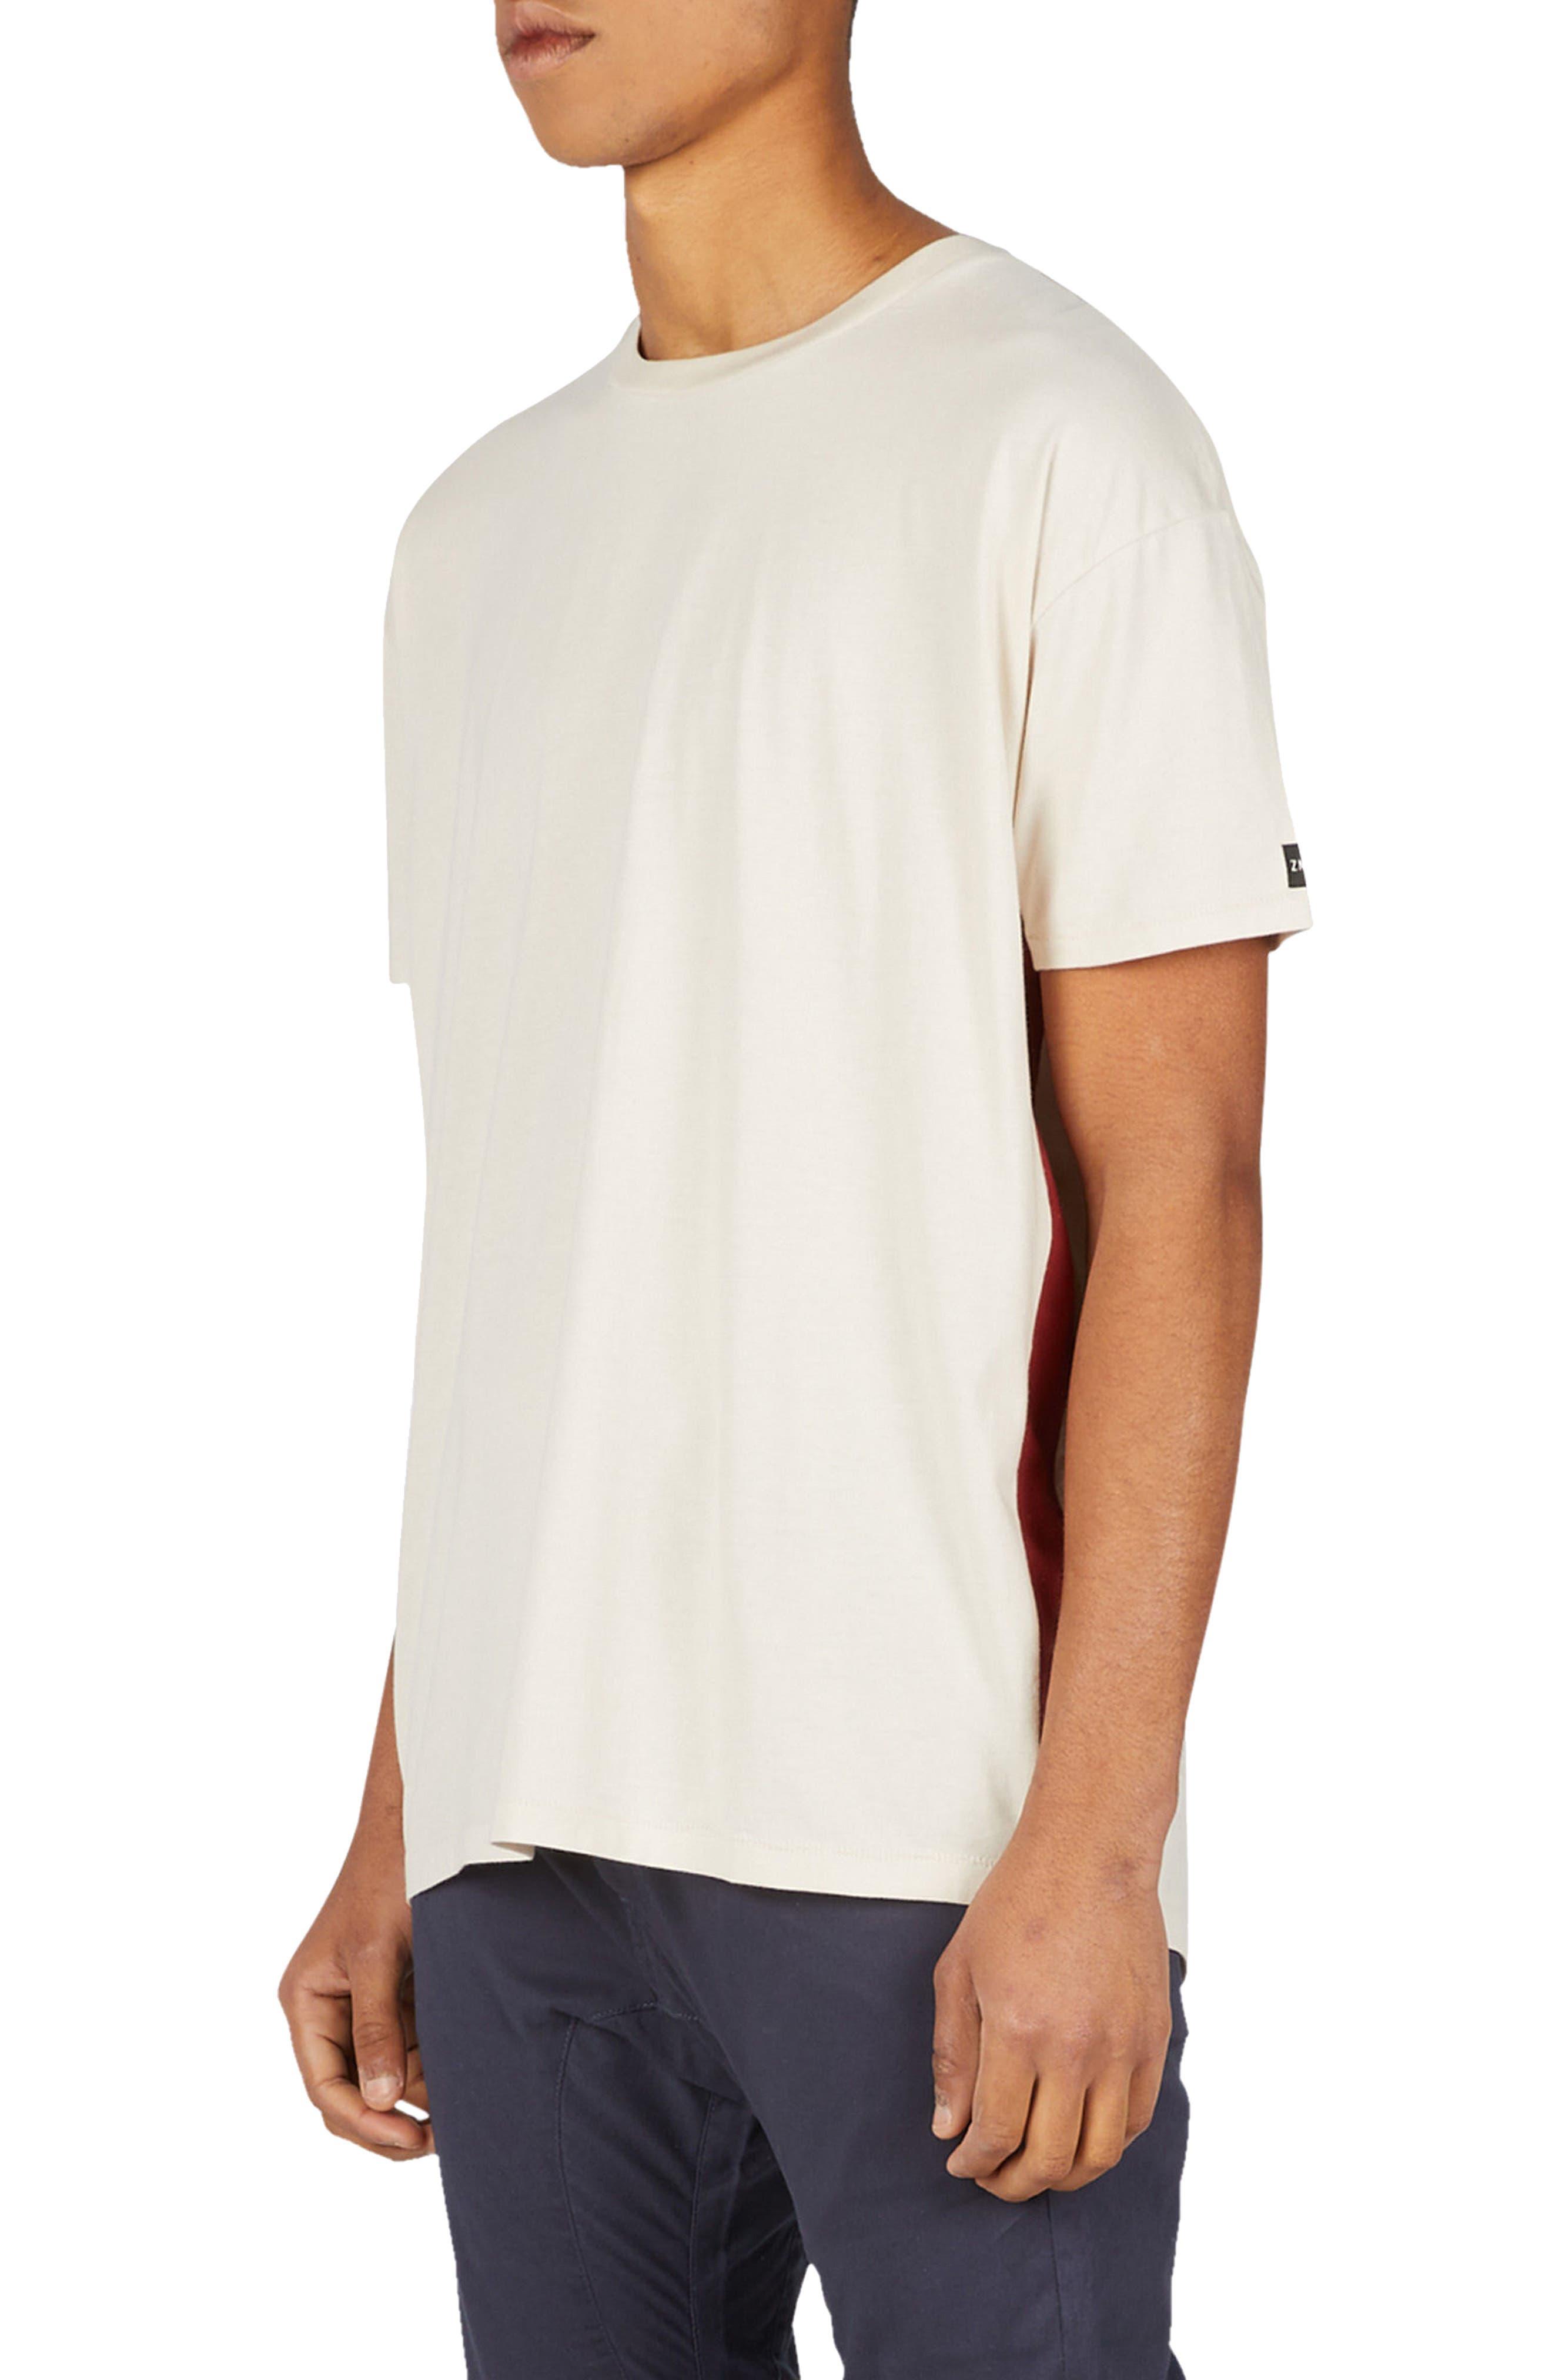 Sideline Rugger T-Shirt,                             Main thumbnail 1, color,                             Natural